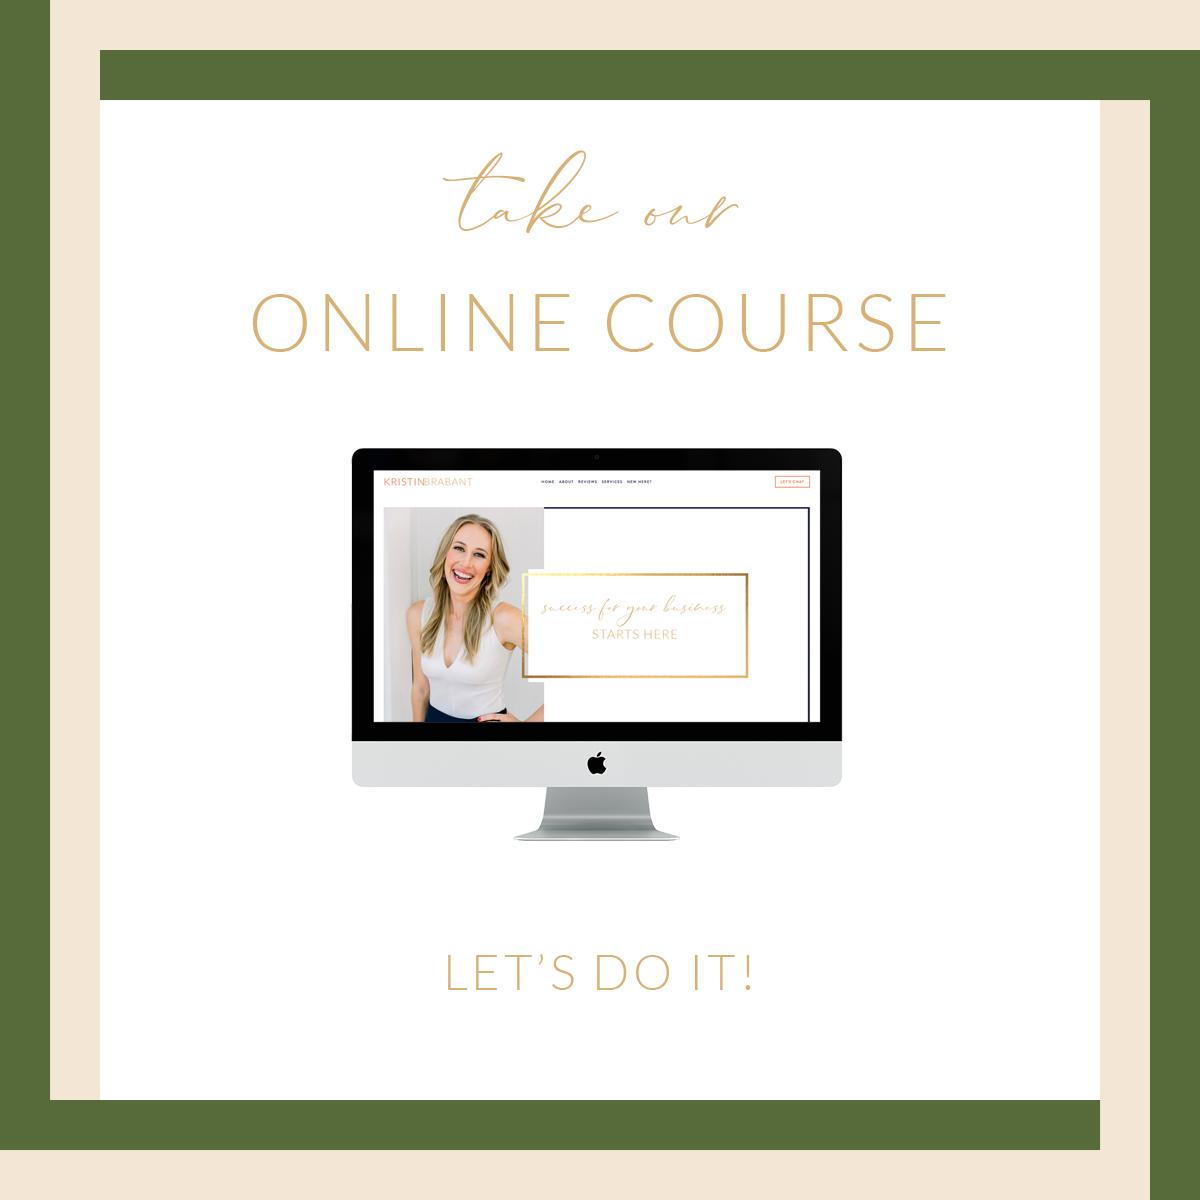 kb_online_course.jpg